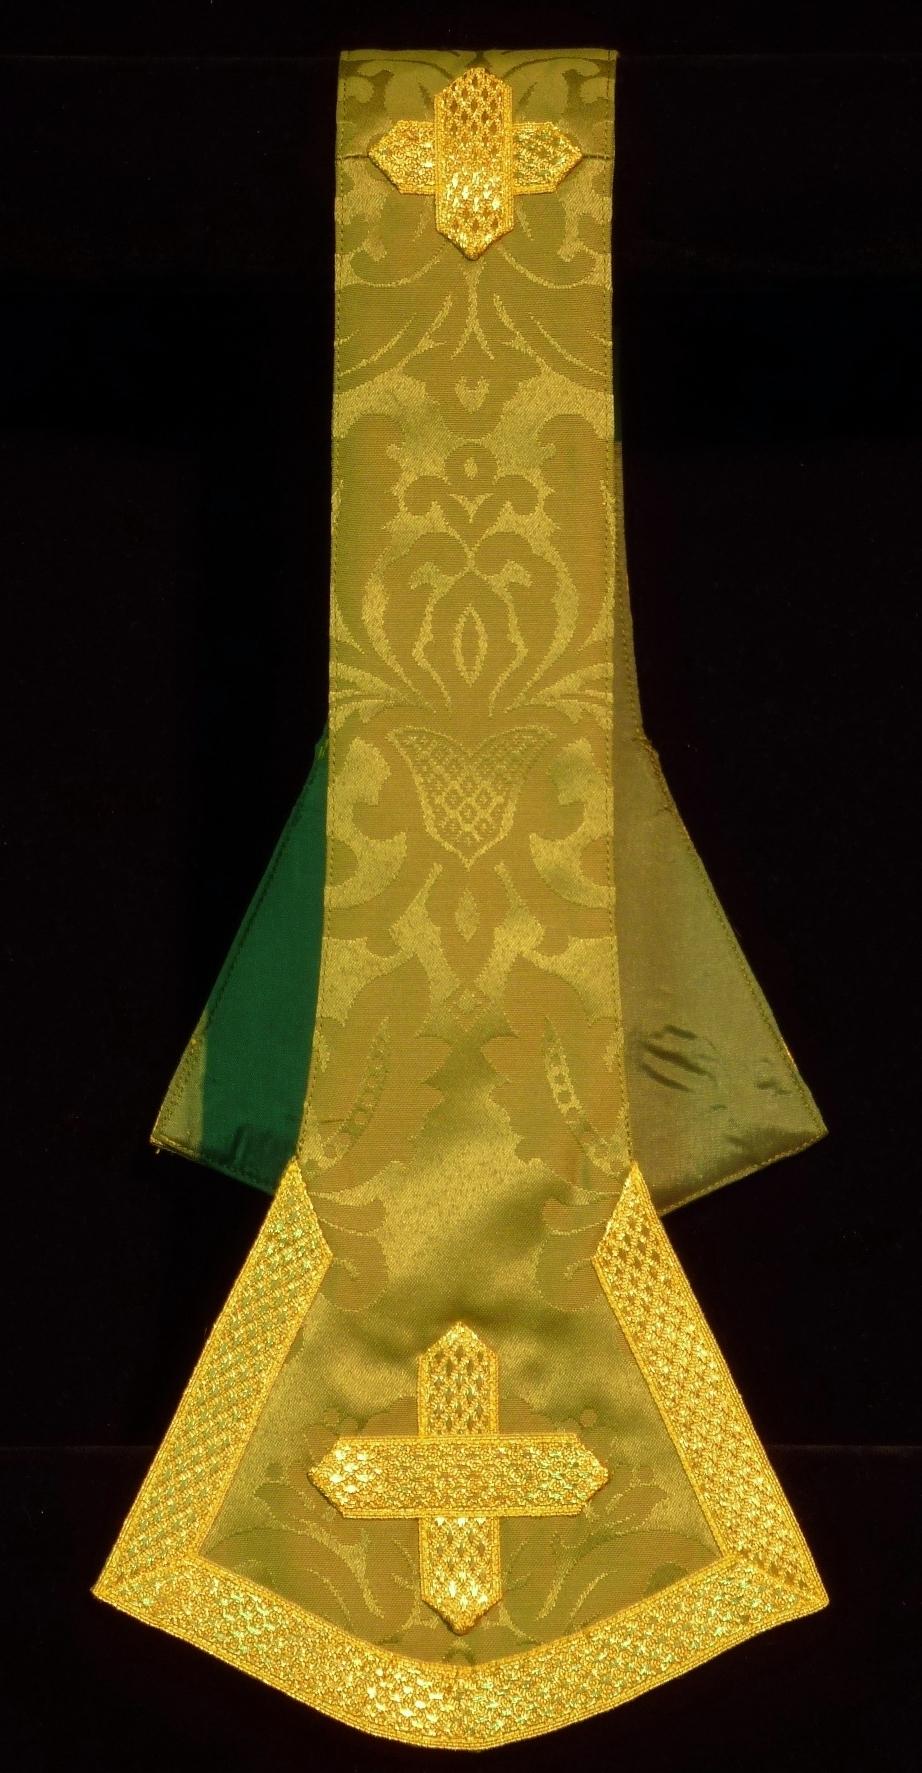 Manípulo, tela de damasco